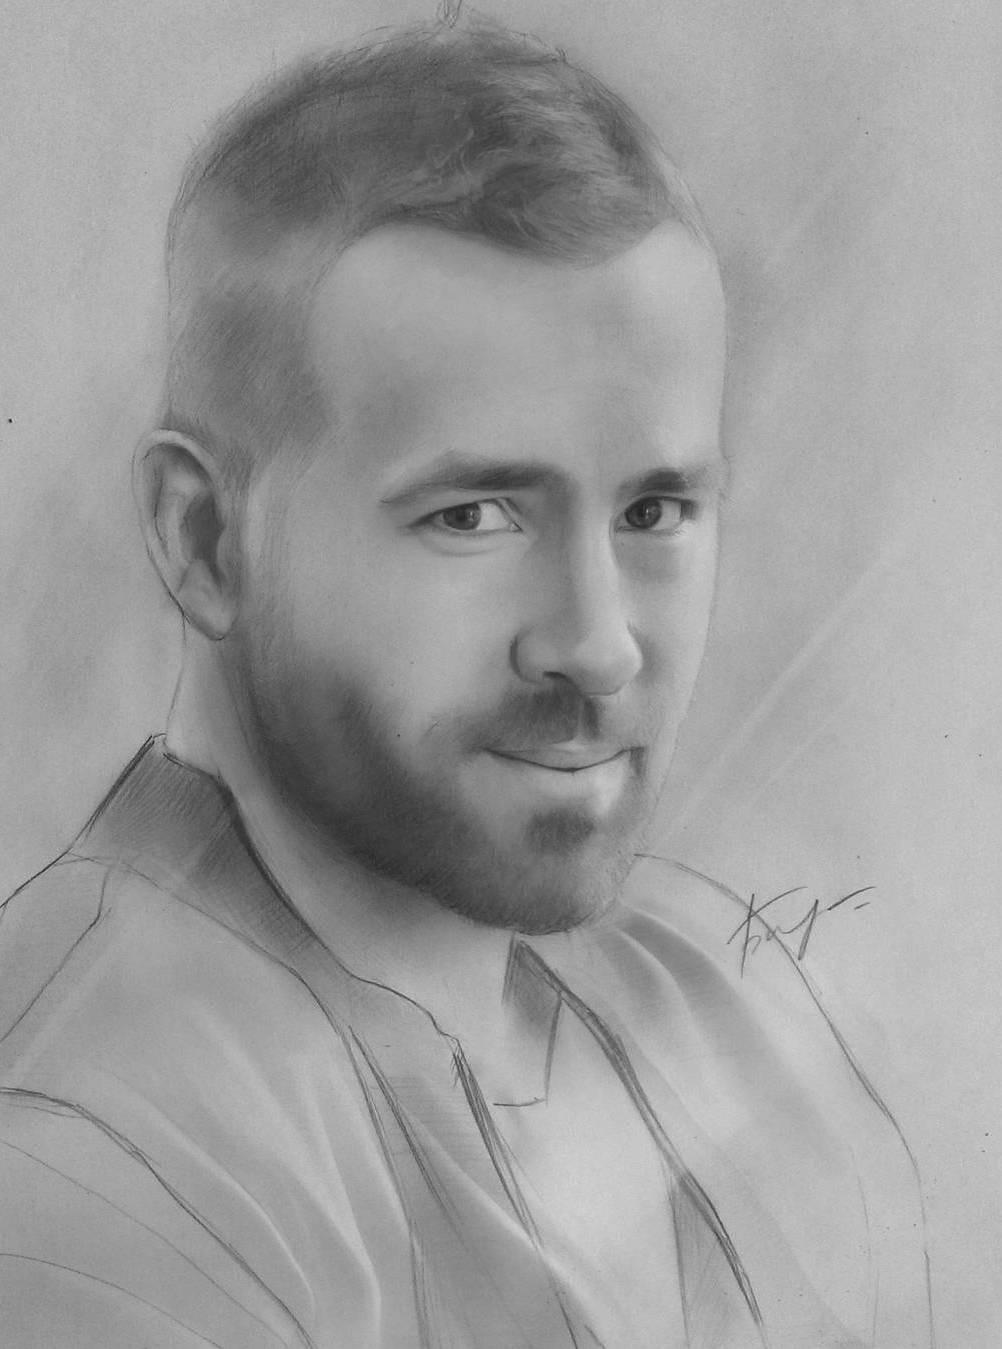 16 man portrait pencil drawings by vita biryulina